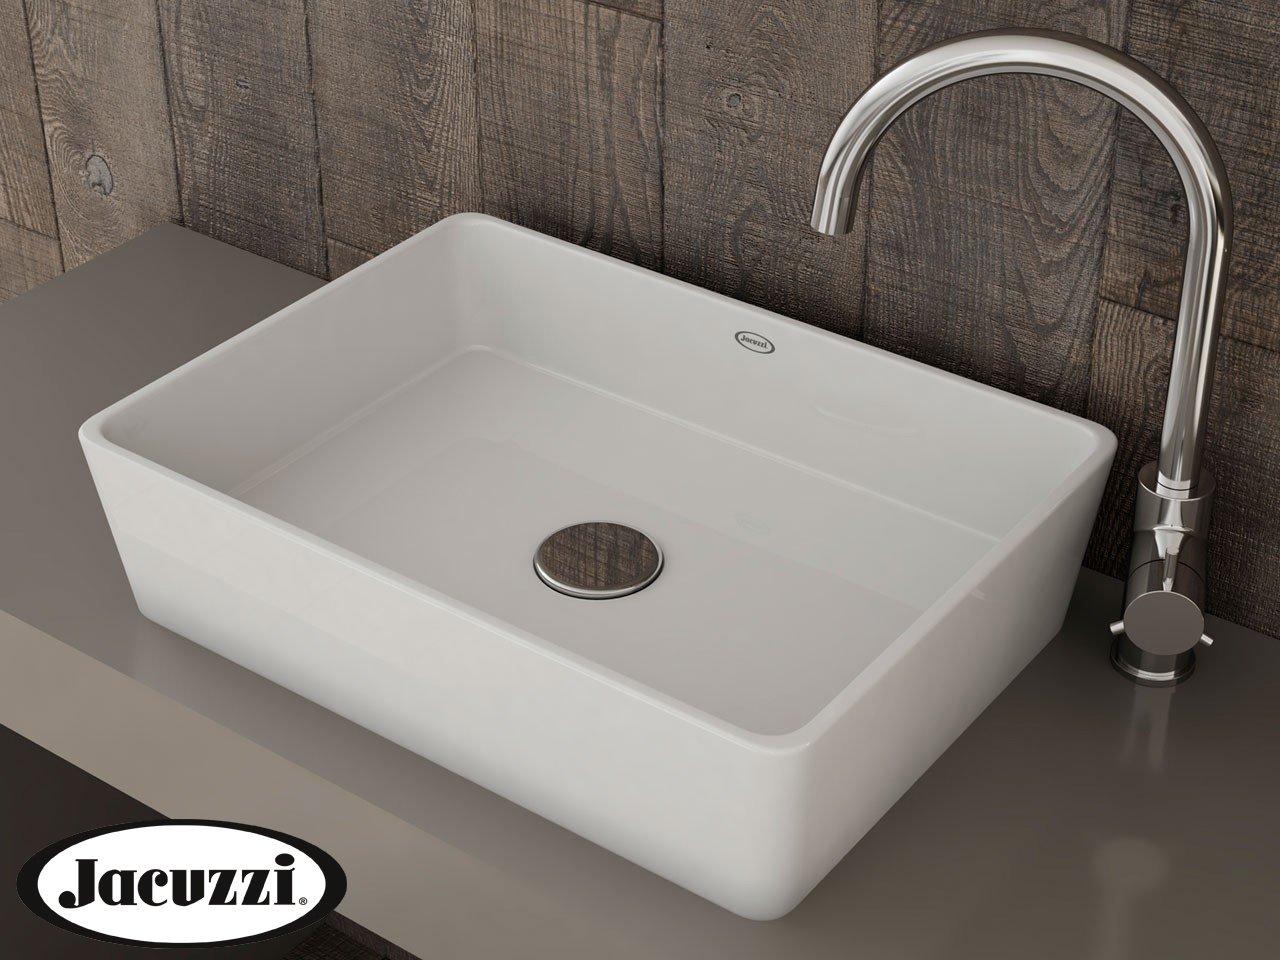 Glow Rectangular Countertop basin White 50 x 36 x 13